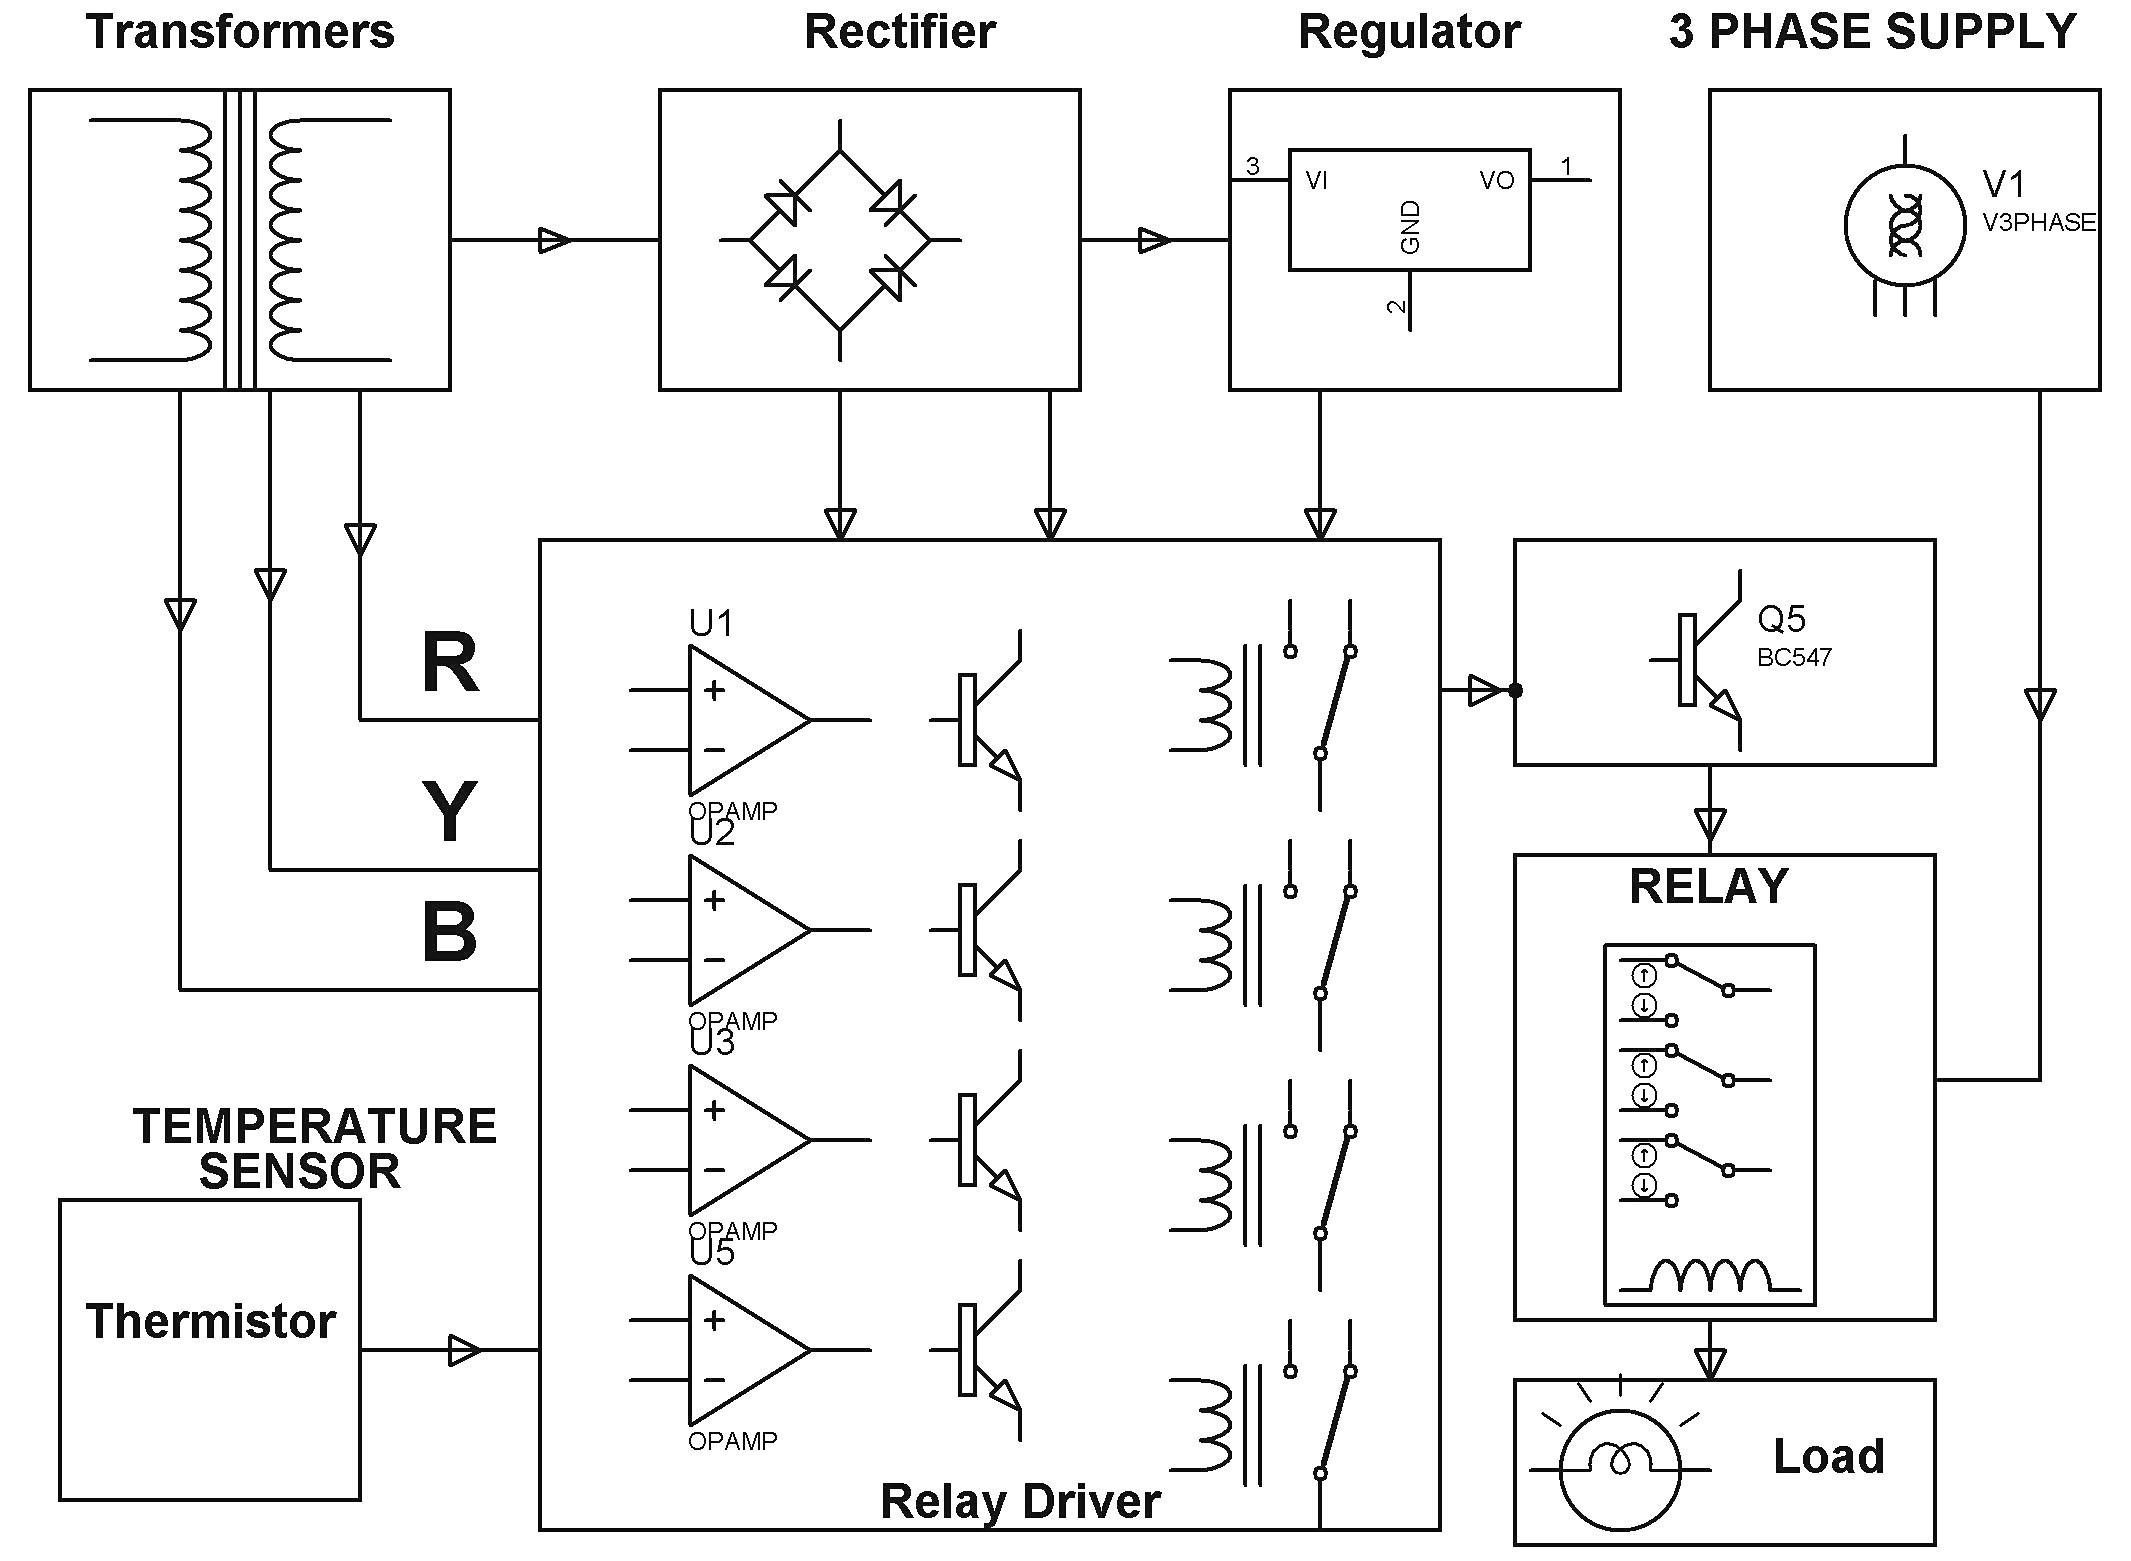 Three Phase Wiring Diagram 2018 Cutler Hammer Starter Wiring Diagram Elegant 3tf5222 0d Contactors